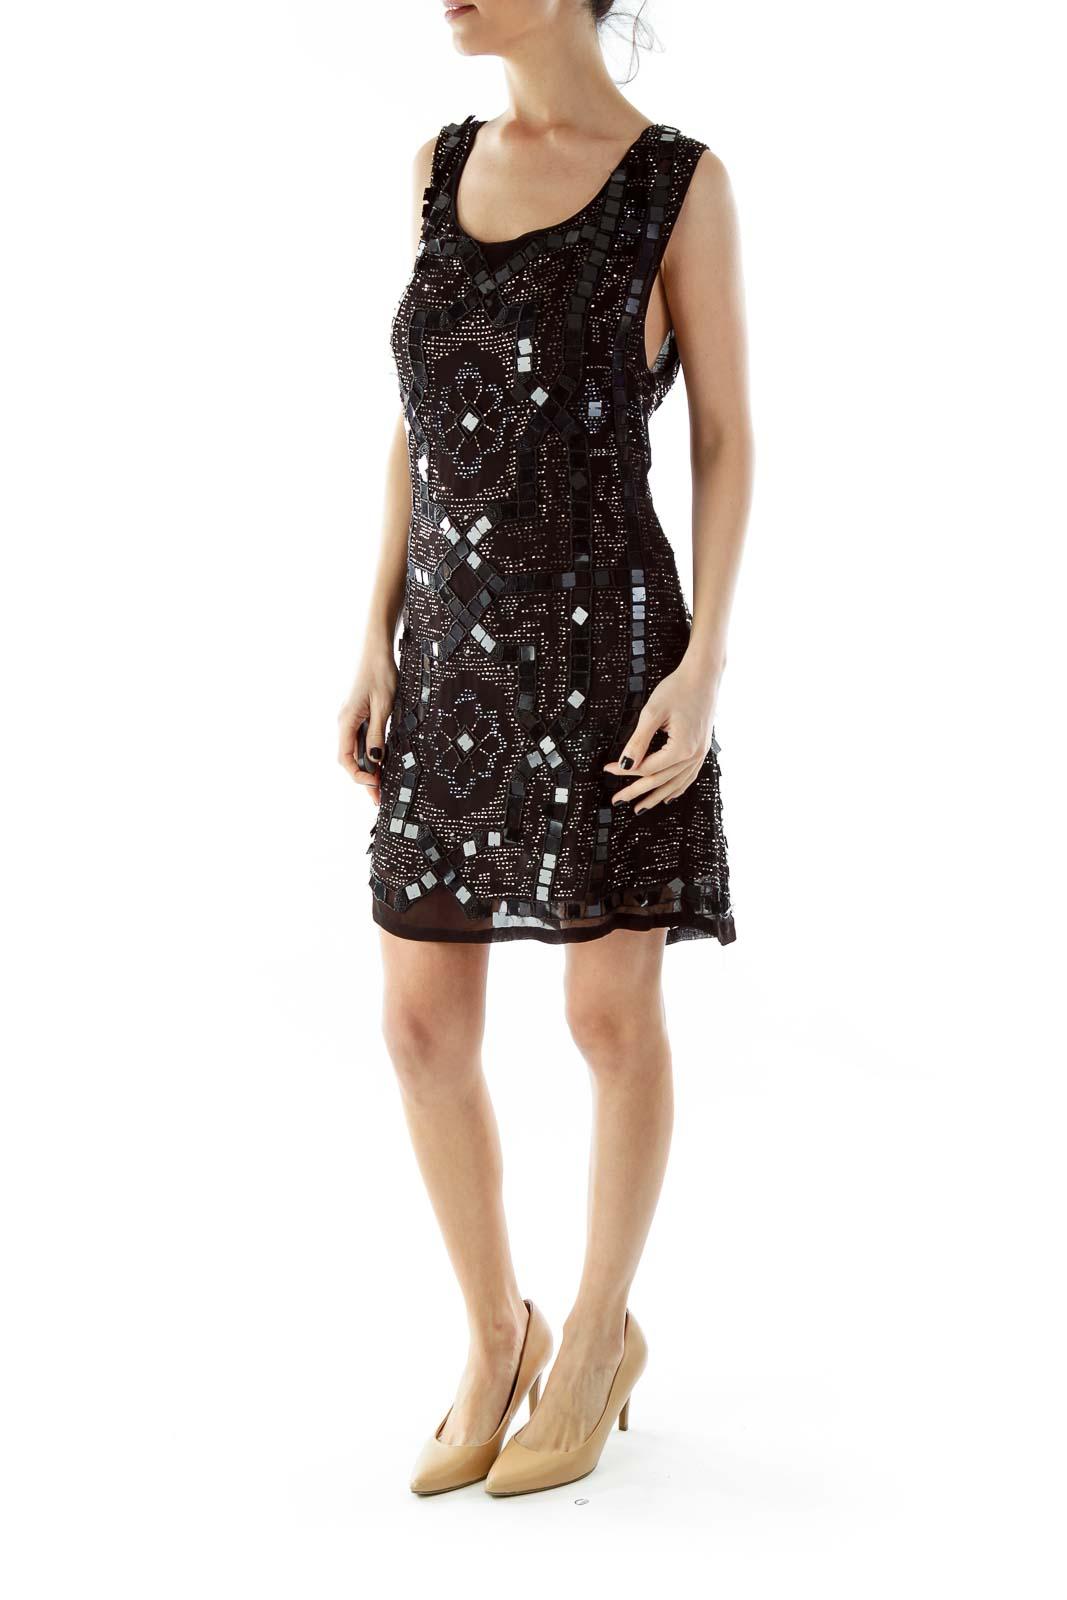 Black Sequined Open-Back Mini Cocktail Dress